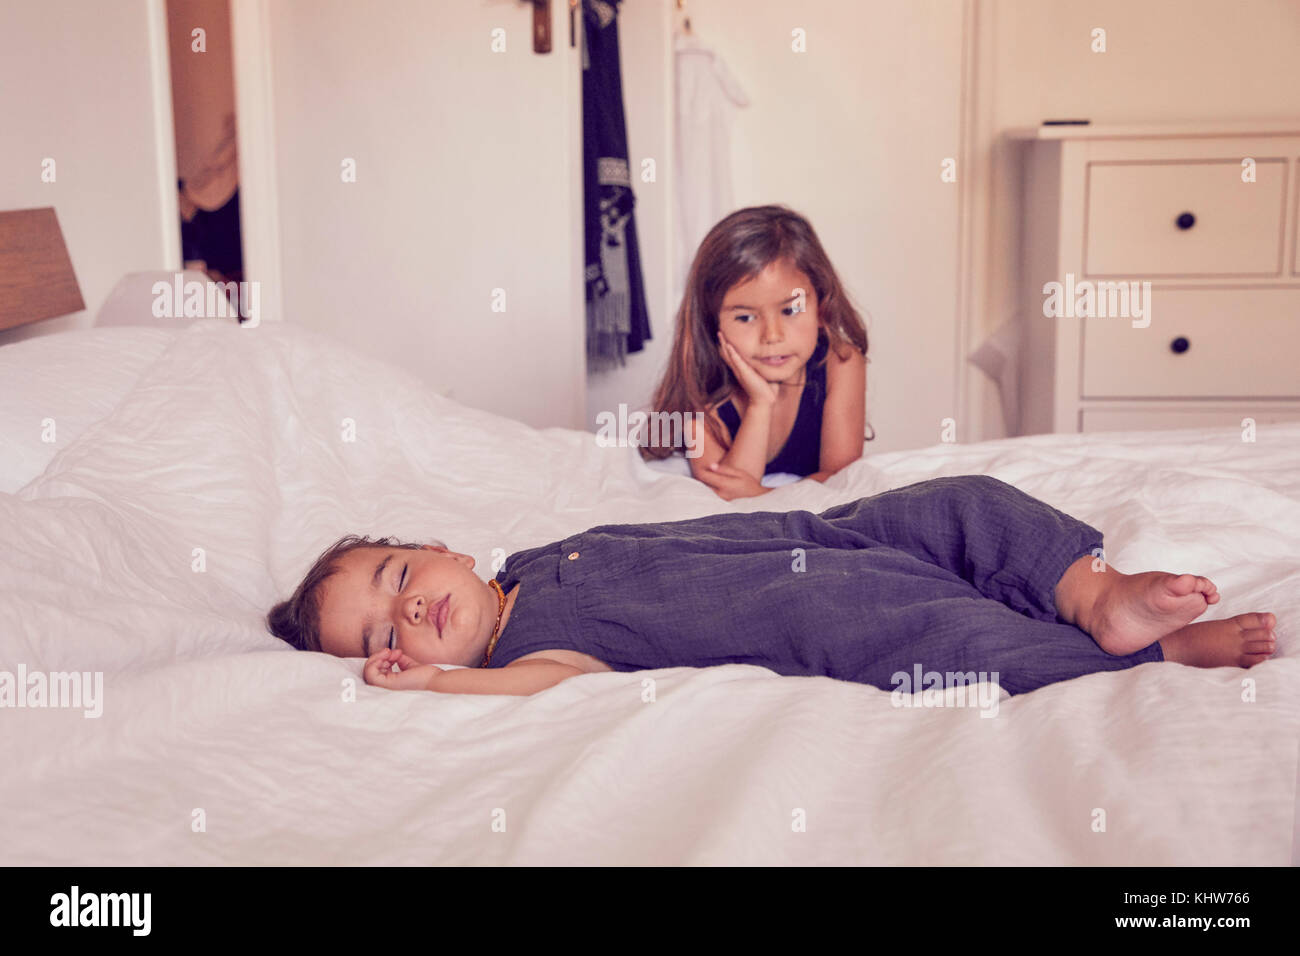 Female toddler, sleeping on bed, older sister watching her sleep - Stock Image